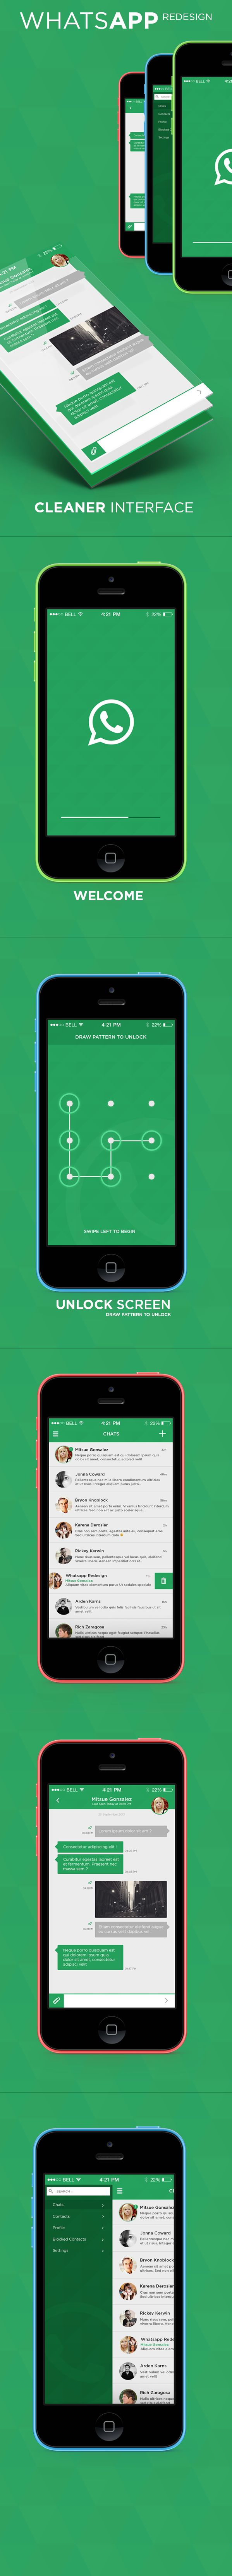 WhatsApp Messenger - iOS 7 Redesign by Rick Karens